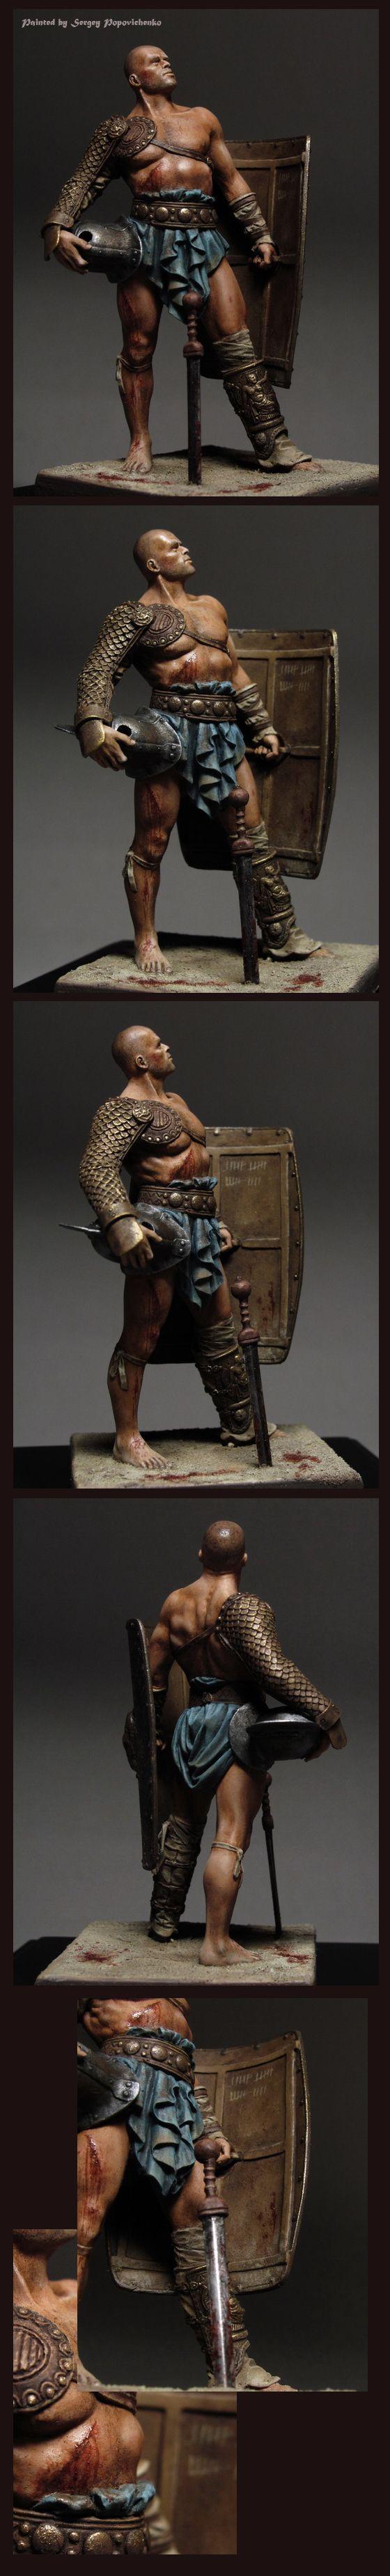 Gladiador pintado por Serguey Popovichenko